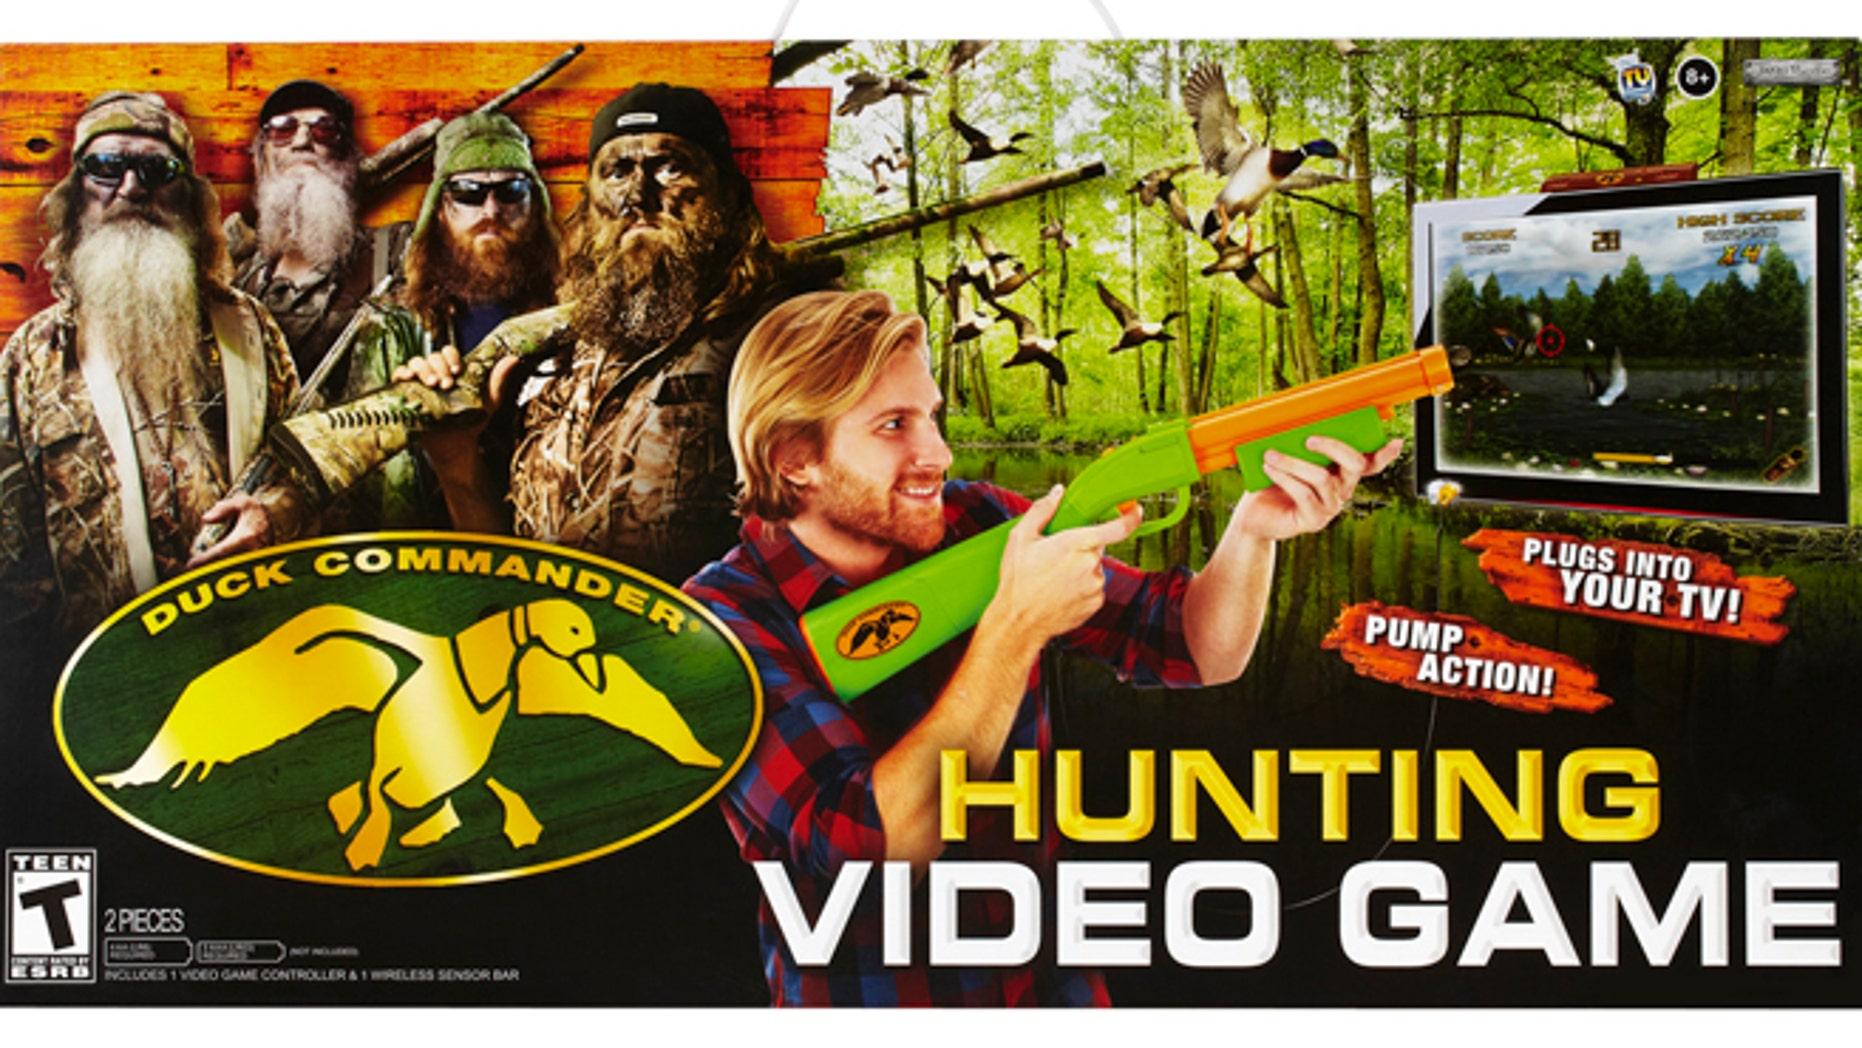 Duck Dynasty video game offers more gun fun  0abcad57e